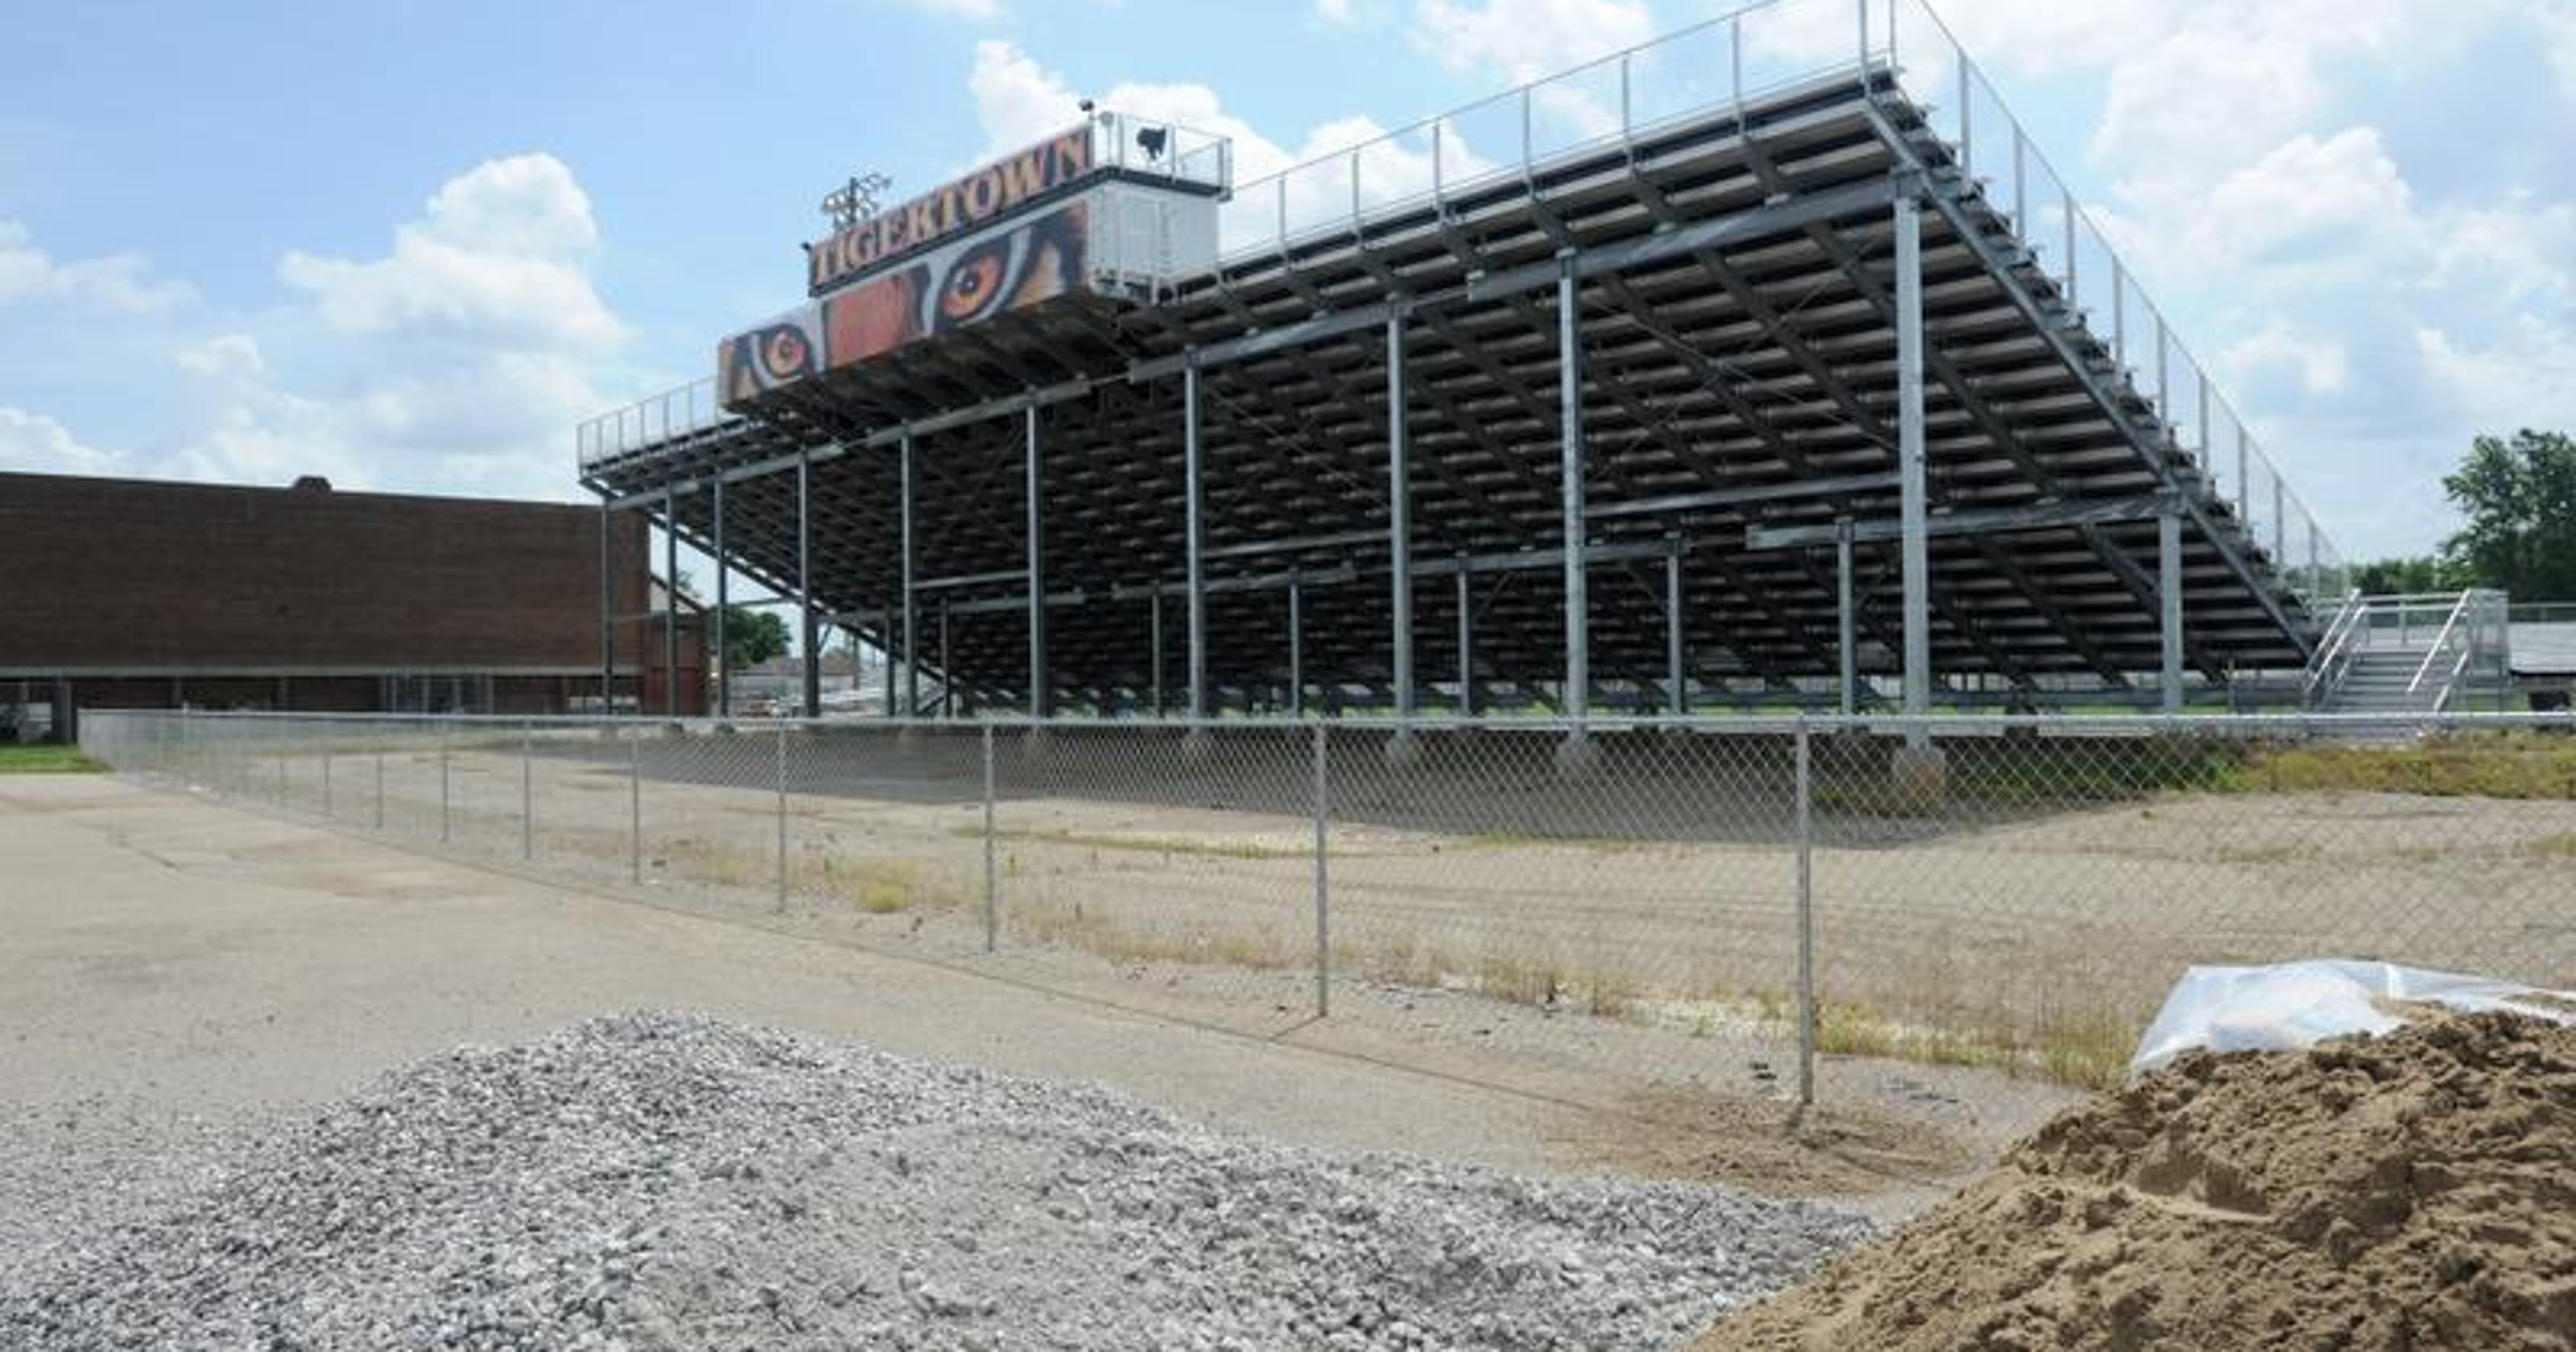 Waverly stadium overhaul underway